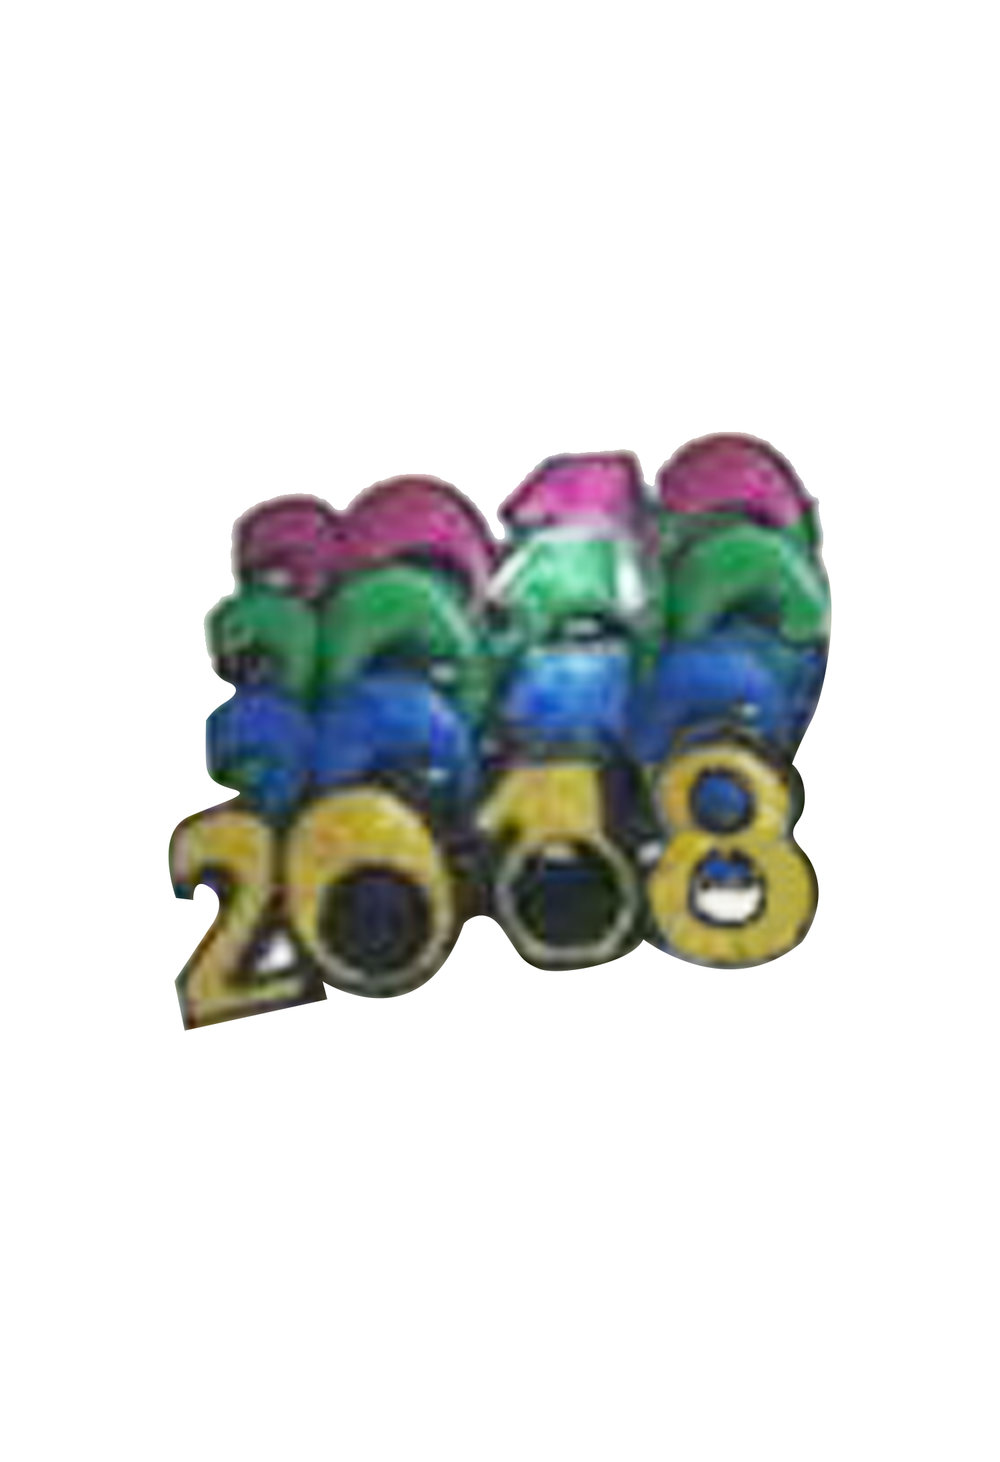 VG2018-1  2018